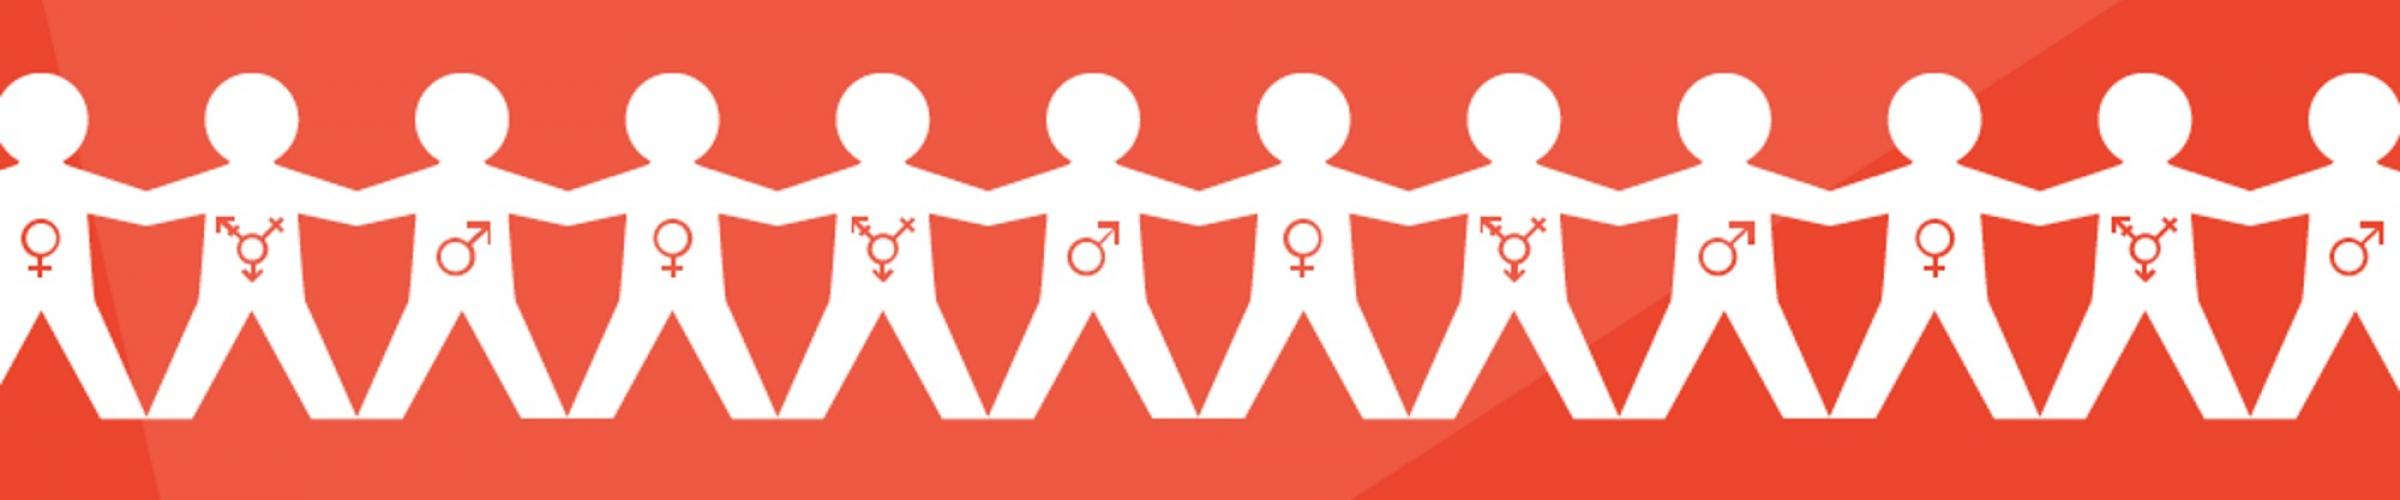 Should we celebrate International Women's Day?